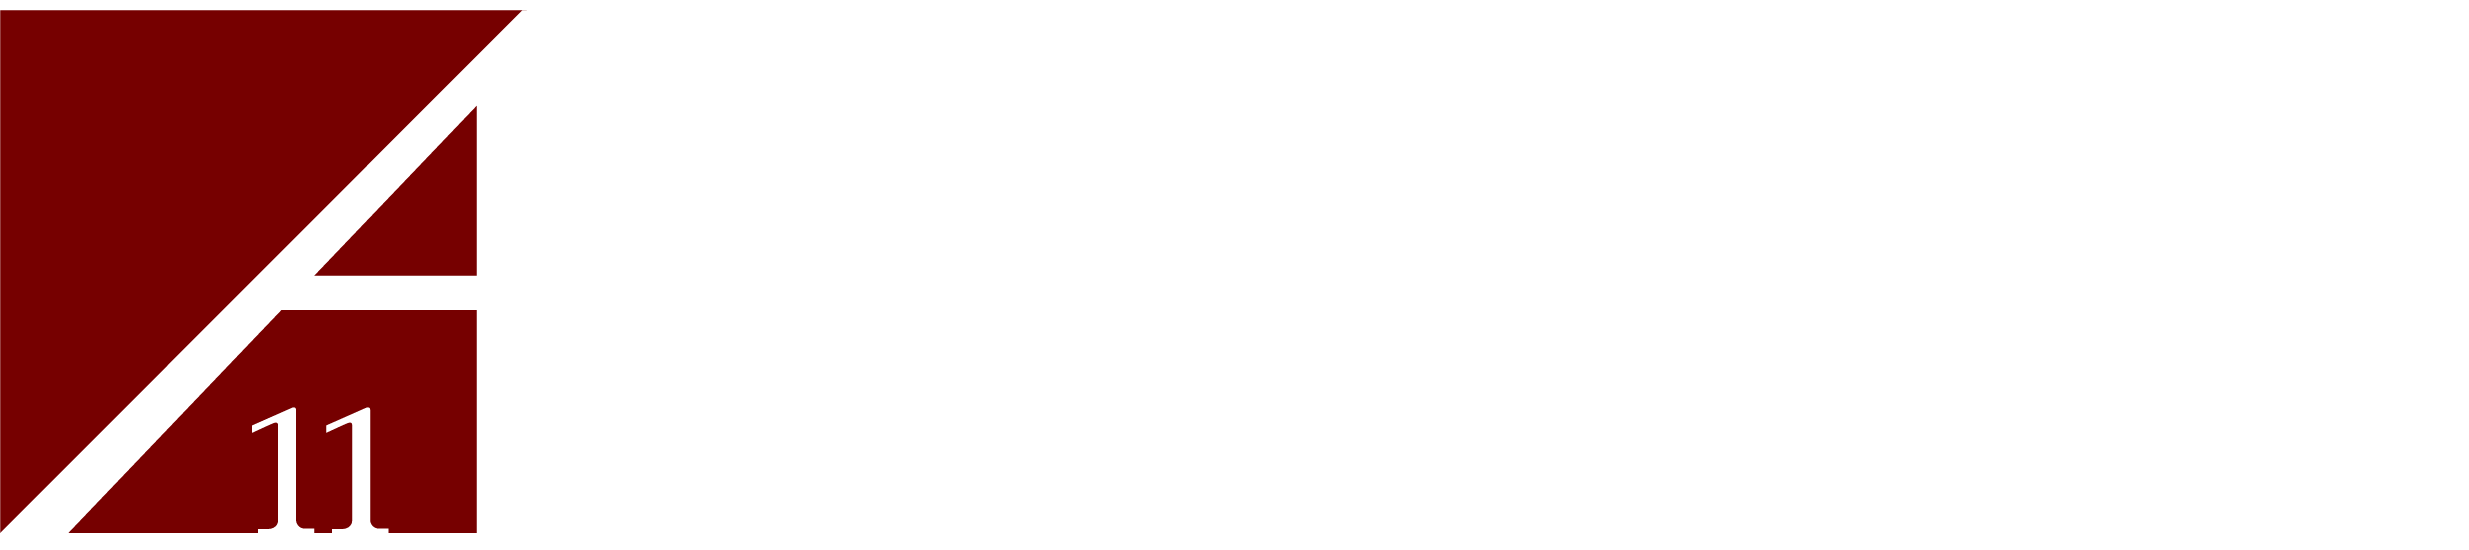 Atelier 11 Architecture